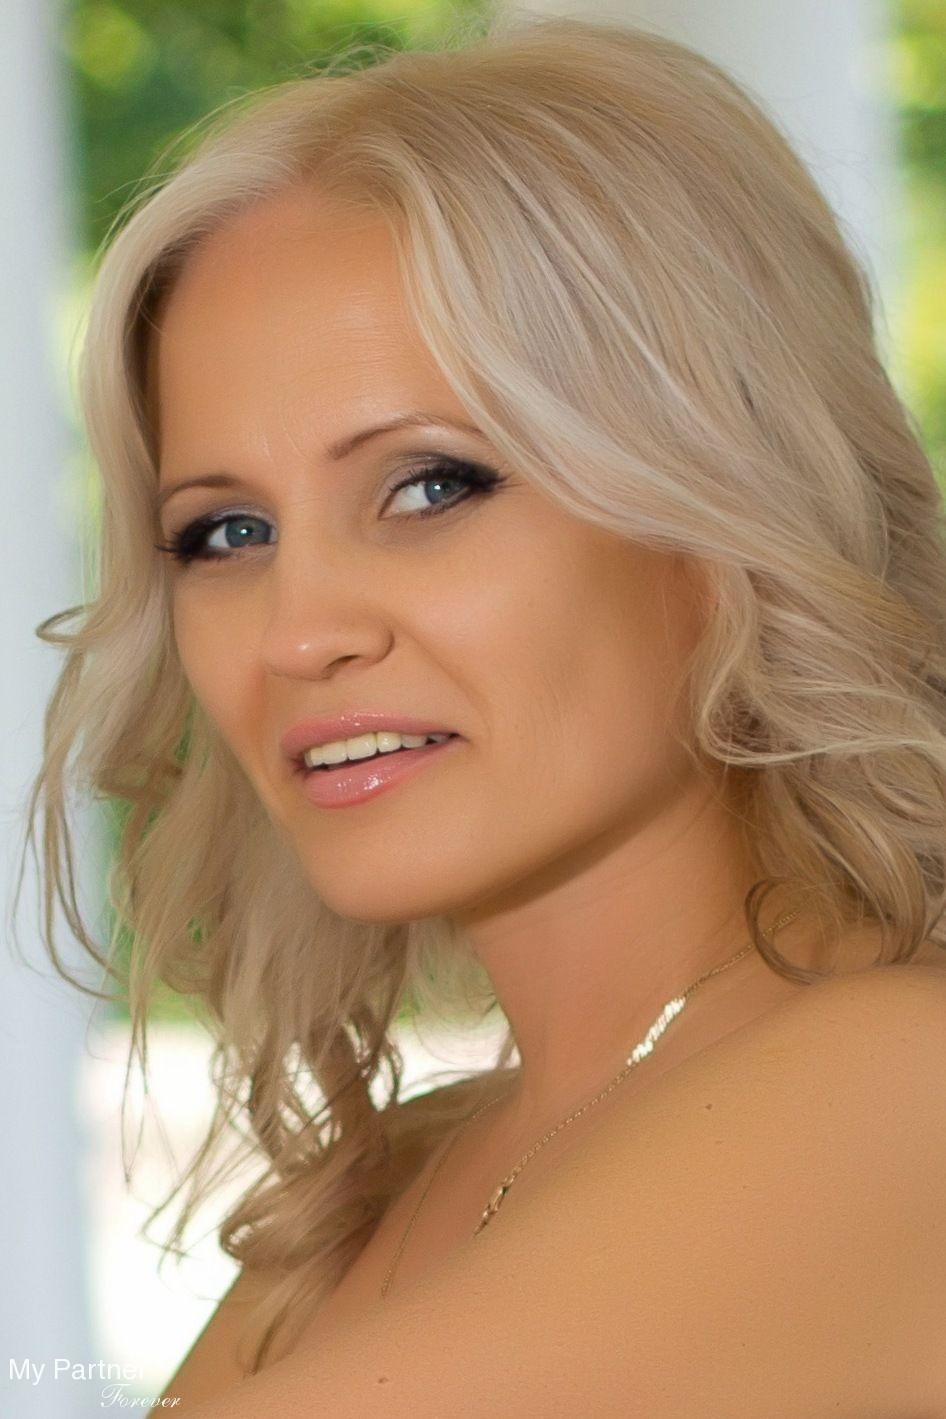 Kiev Connections - Russian Woman, Women Marriage Agency